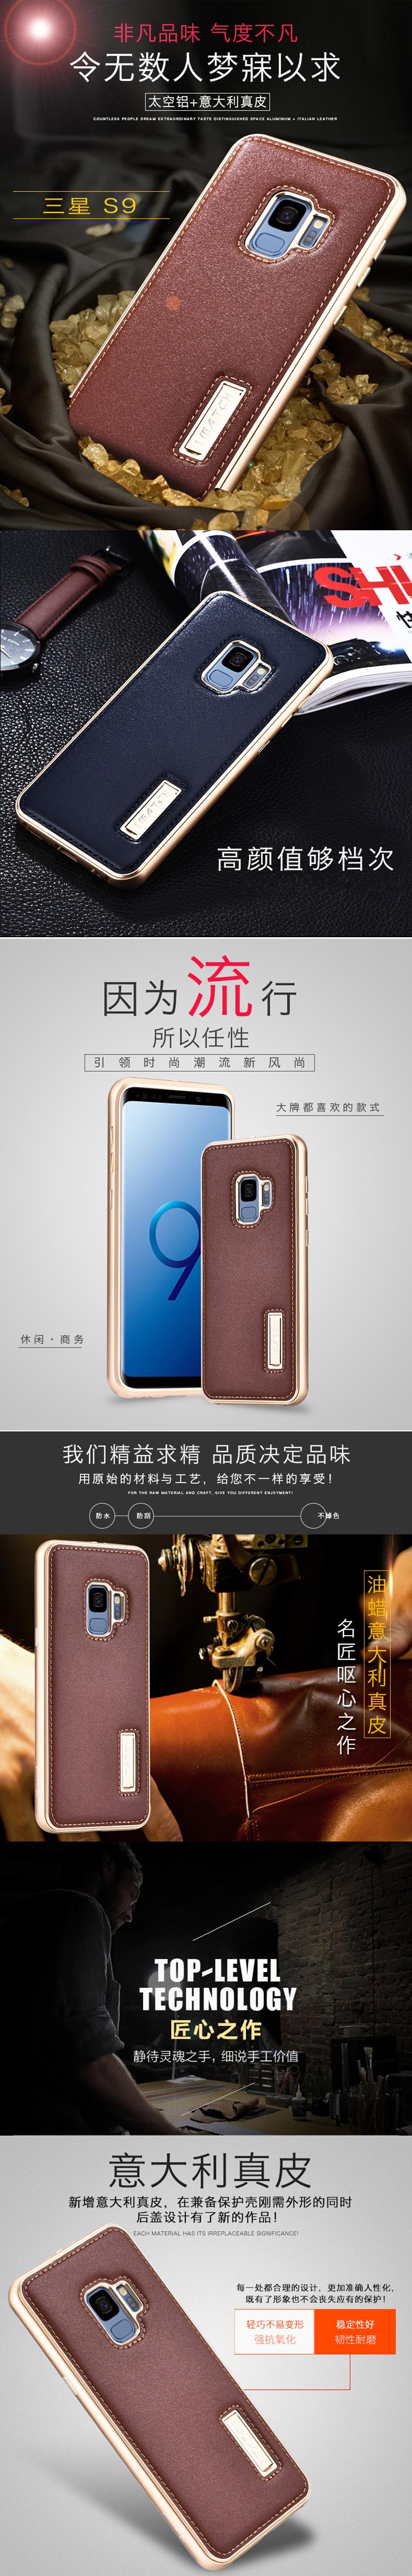 iMatch Luxury Aluminum Metal Bumper Premium Genuine Leather Back Cover Case for Samsung Galaxy S9 & Samsung Galaxy S9 Plus